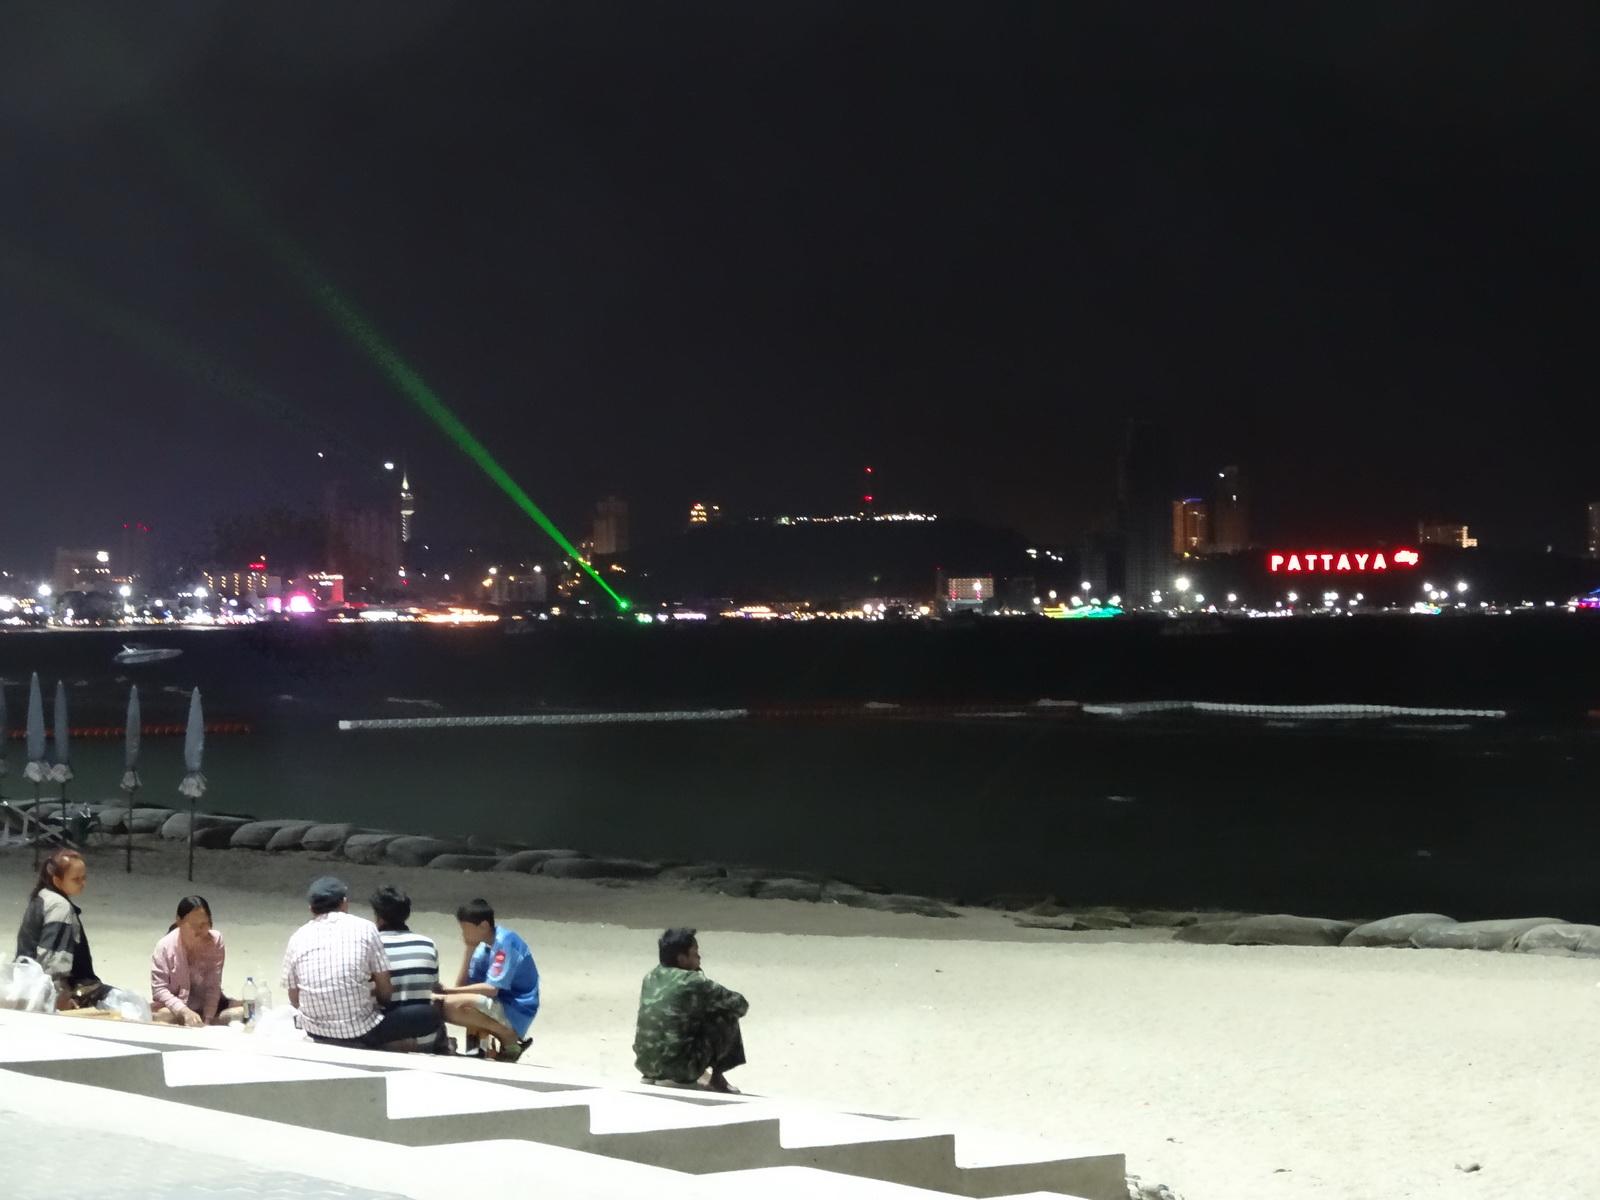 20 Pattaya 361